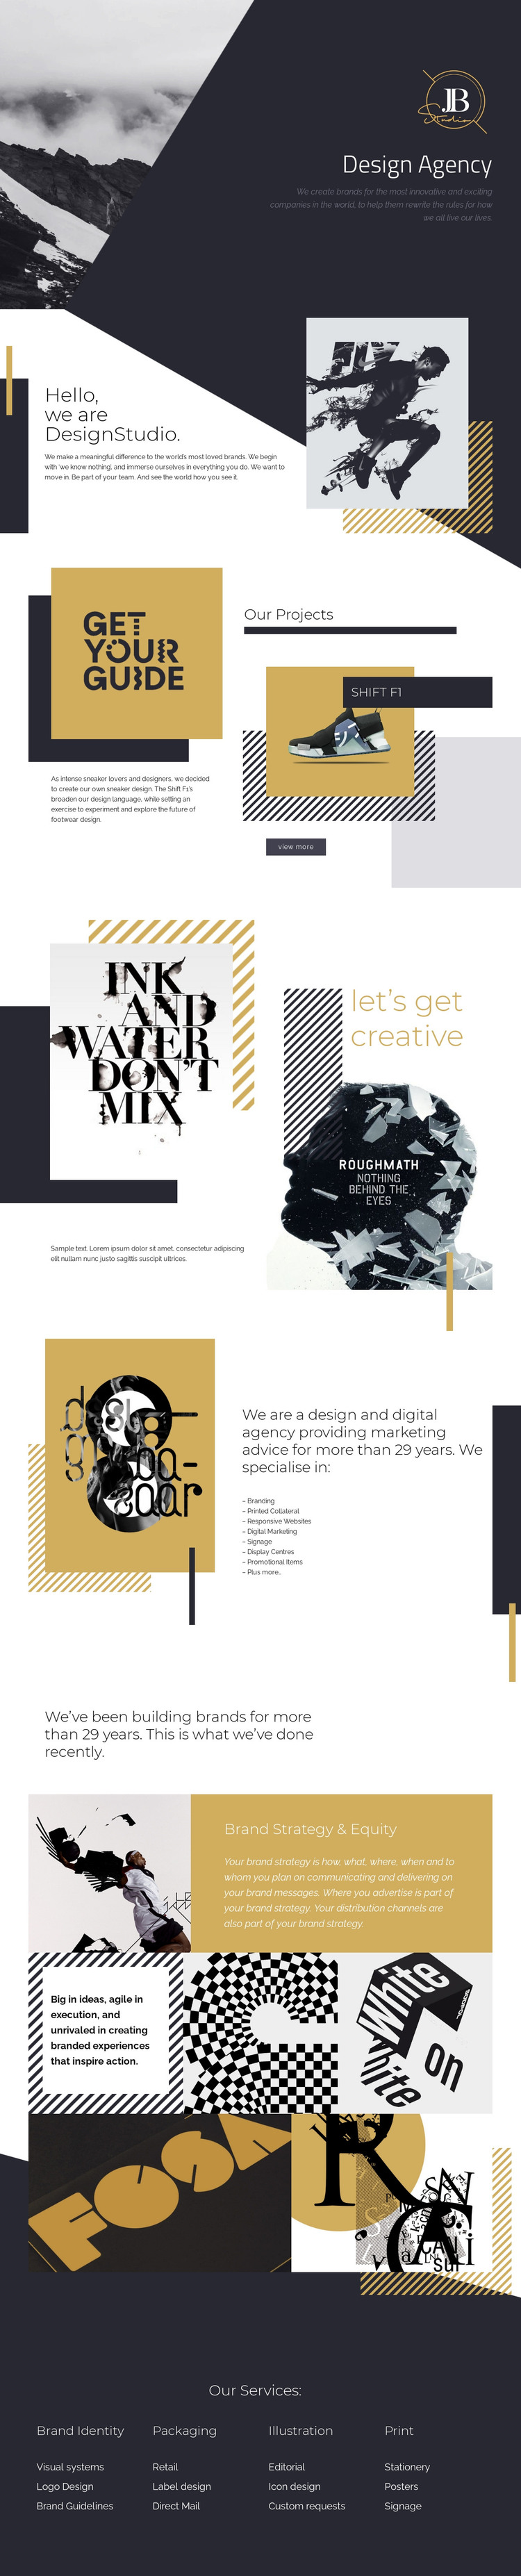 We create amazing websites Web Design